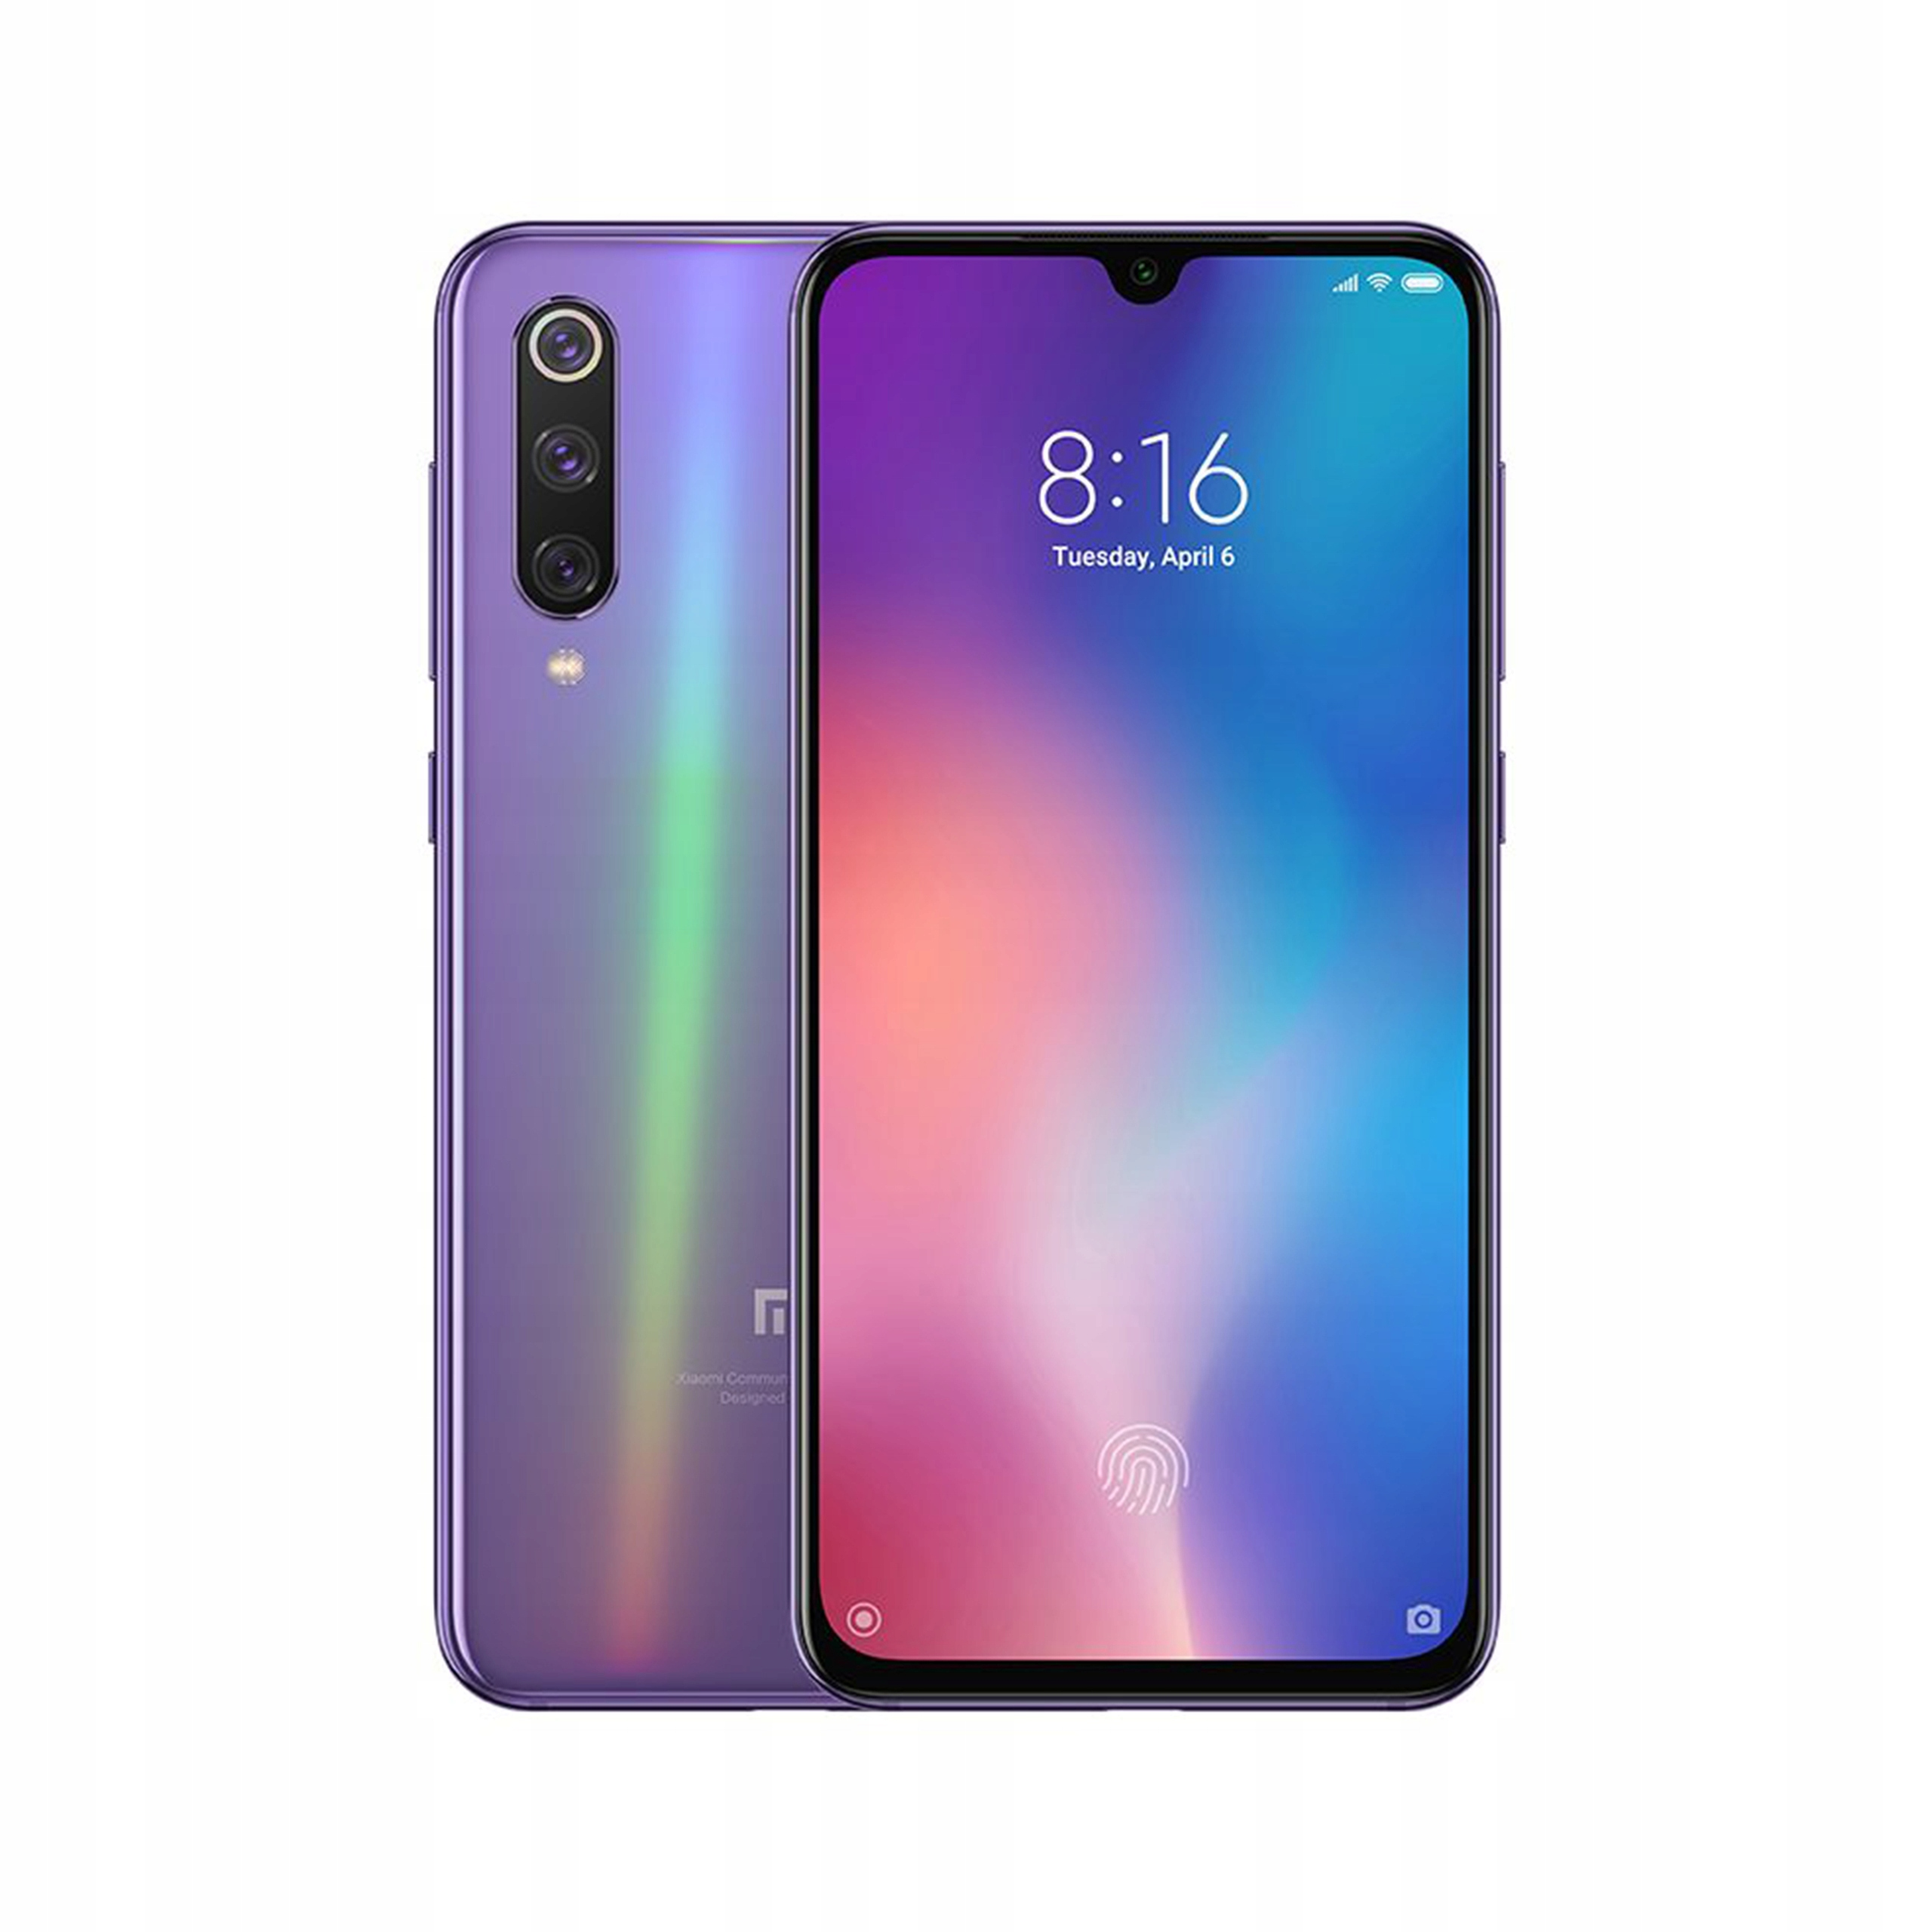 Xiaomi Mi 9 SE Dual - 64GB, 6GB RAM - Global Lavender Violet